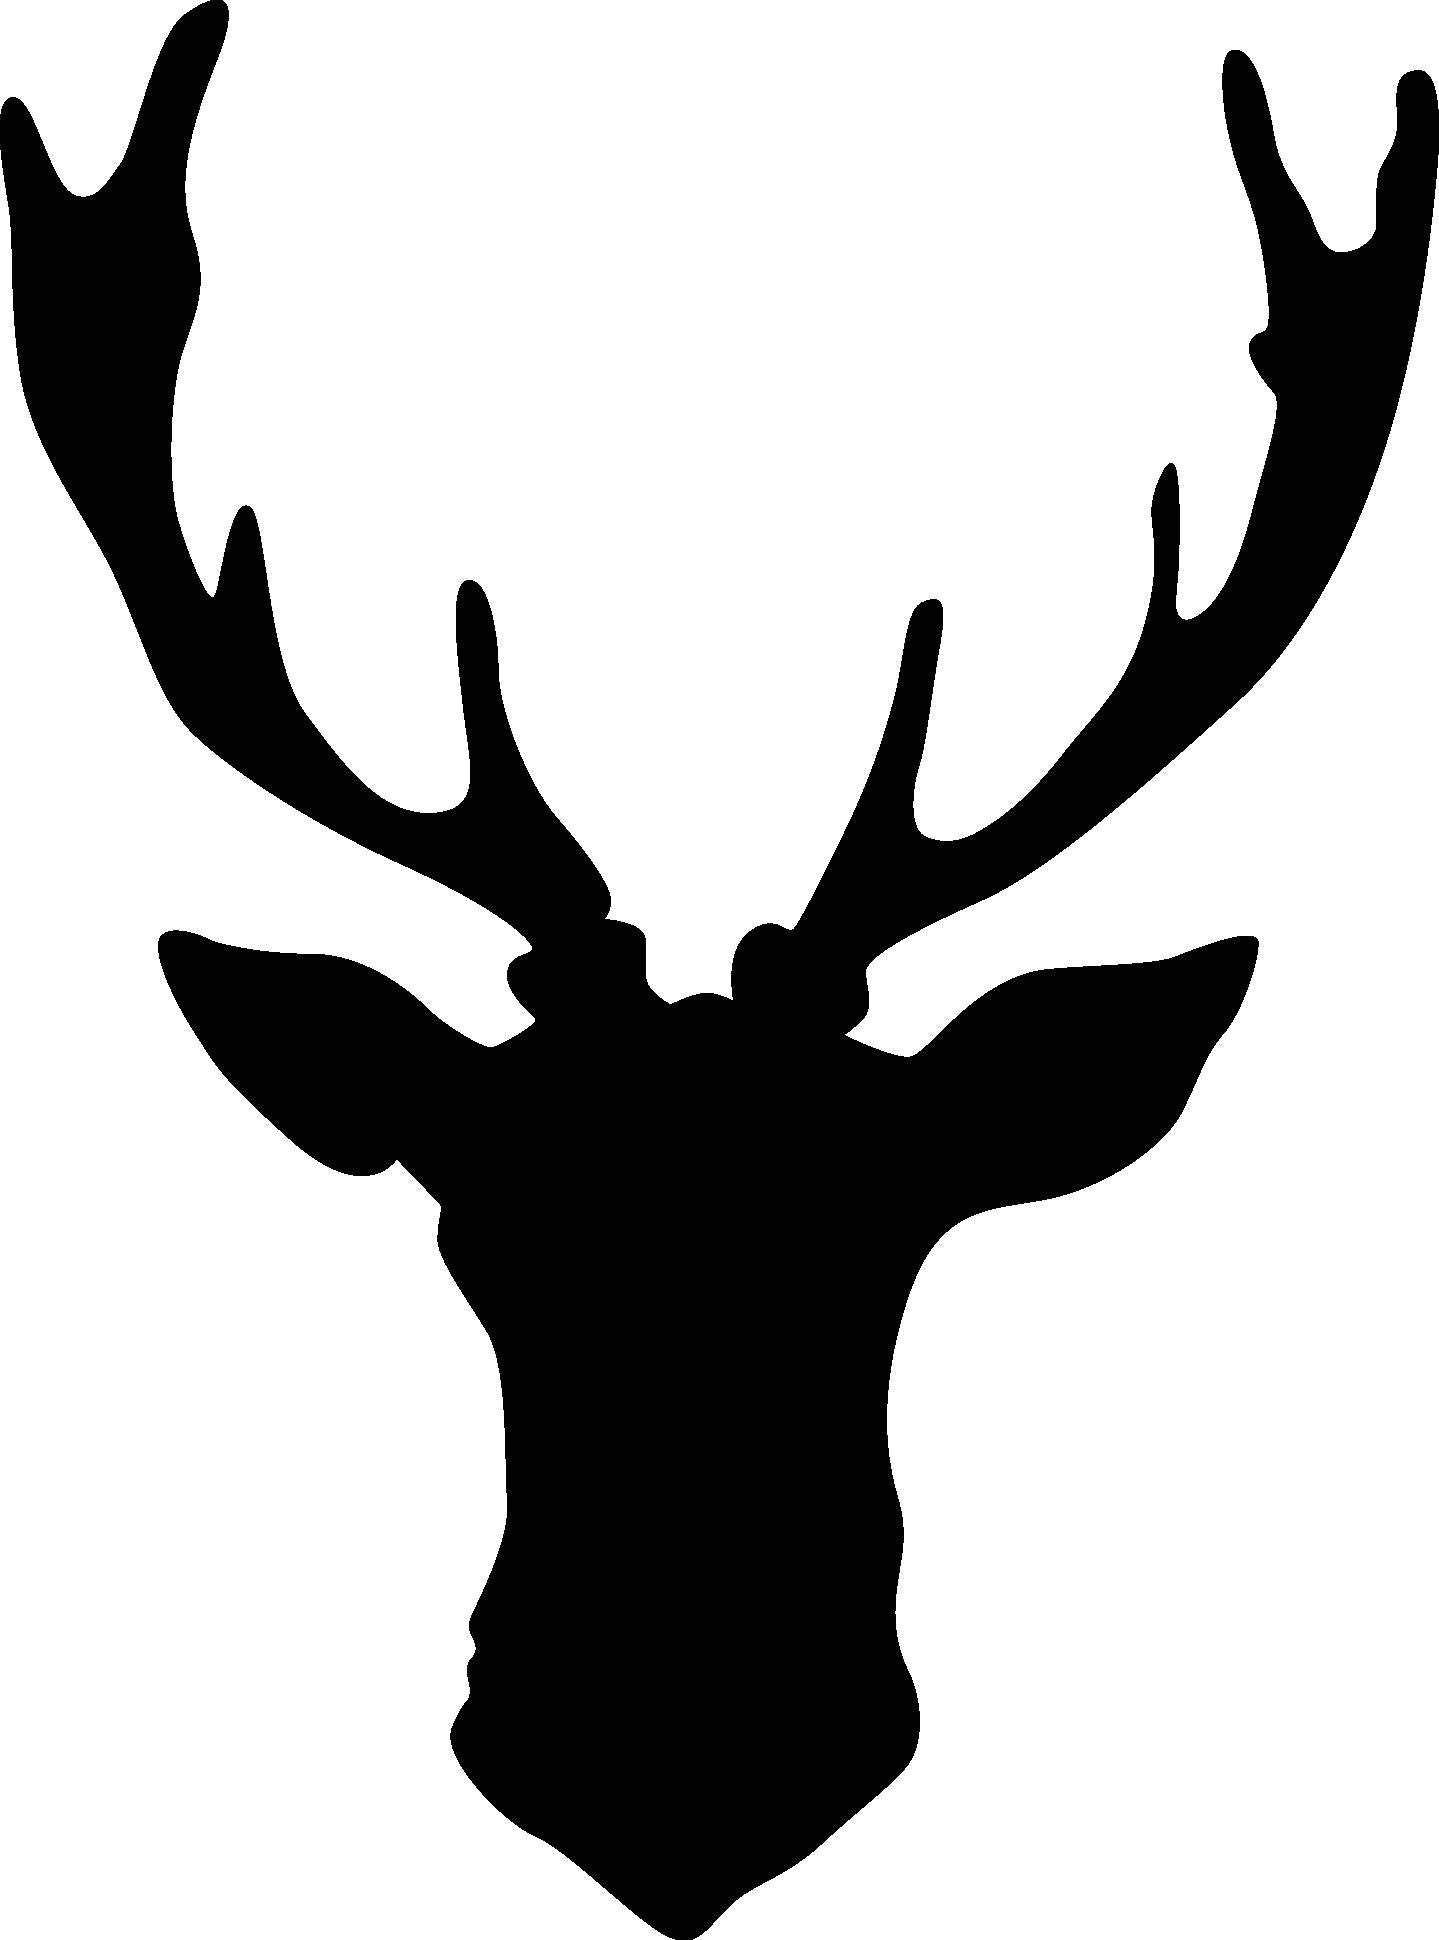 logo_eli_jelinek.png